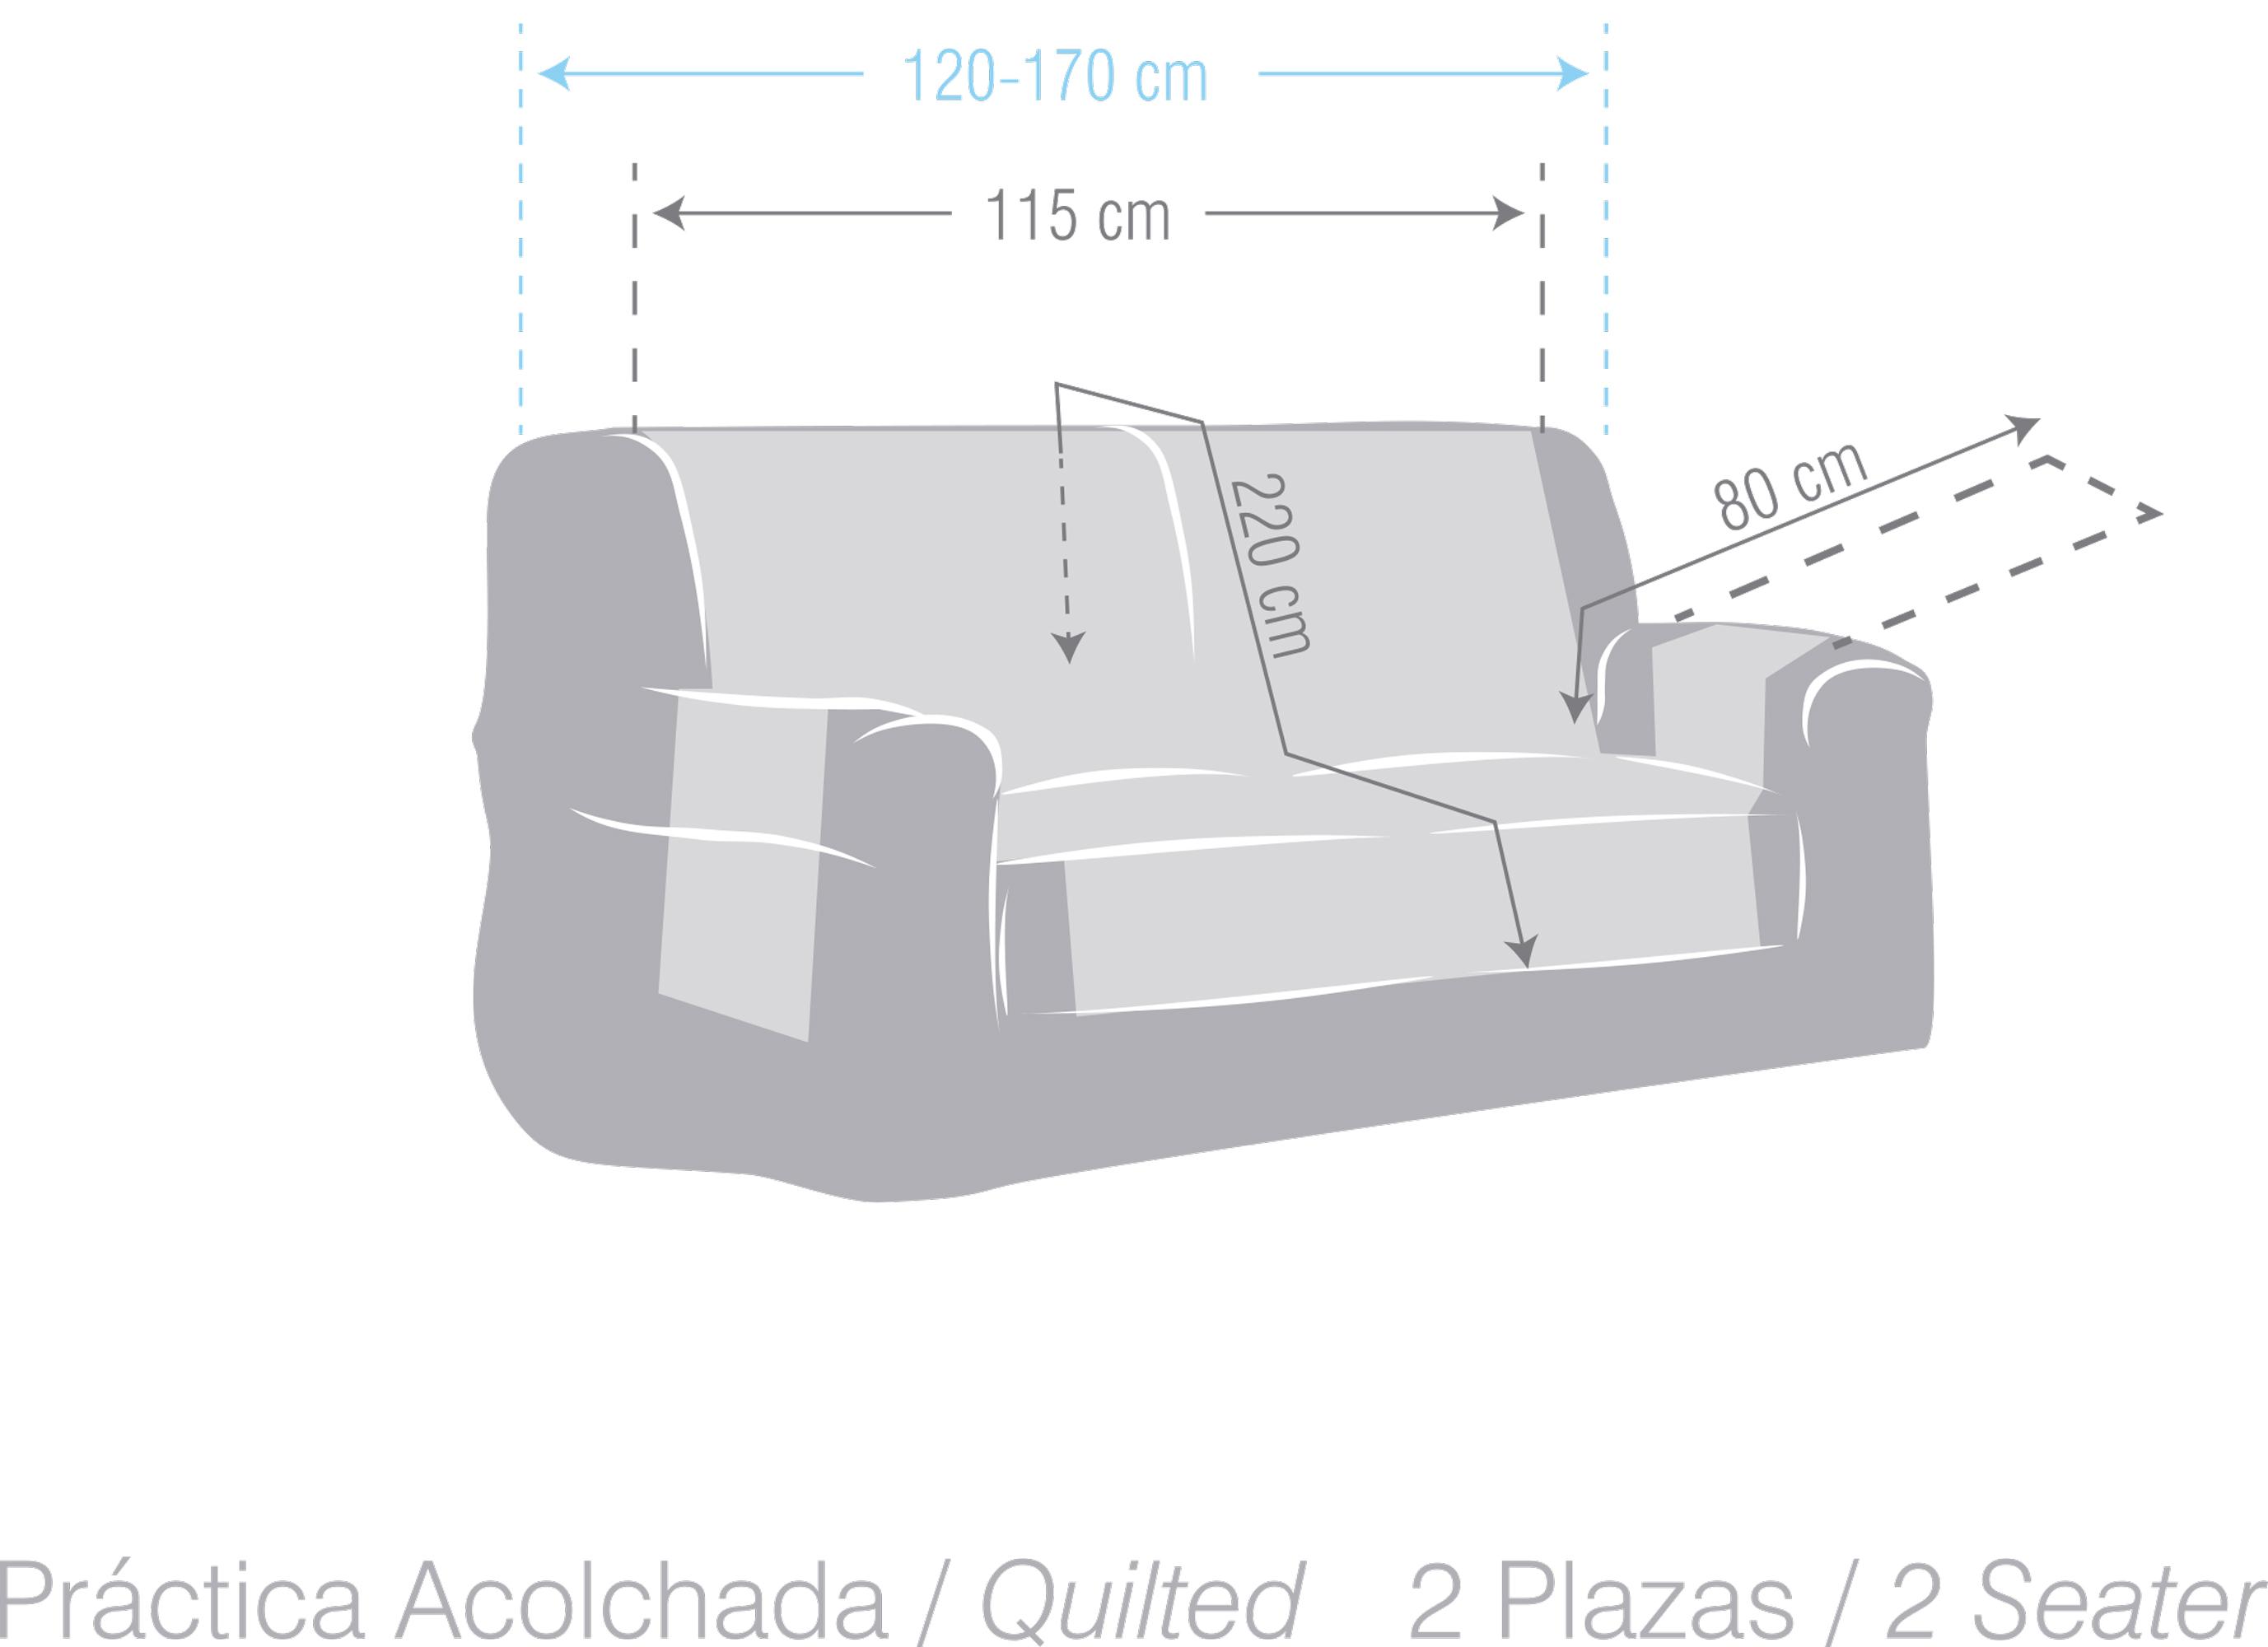 F_PRACTICA-ACOLCHADA-2-PLAZAS.jpg